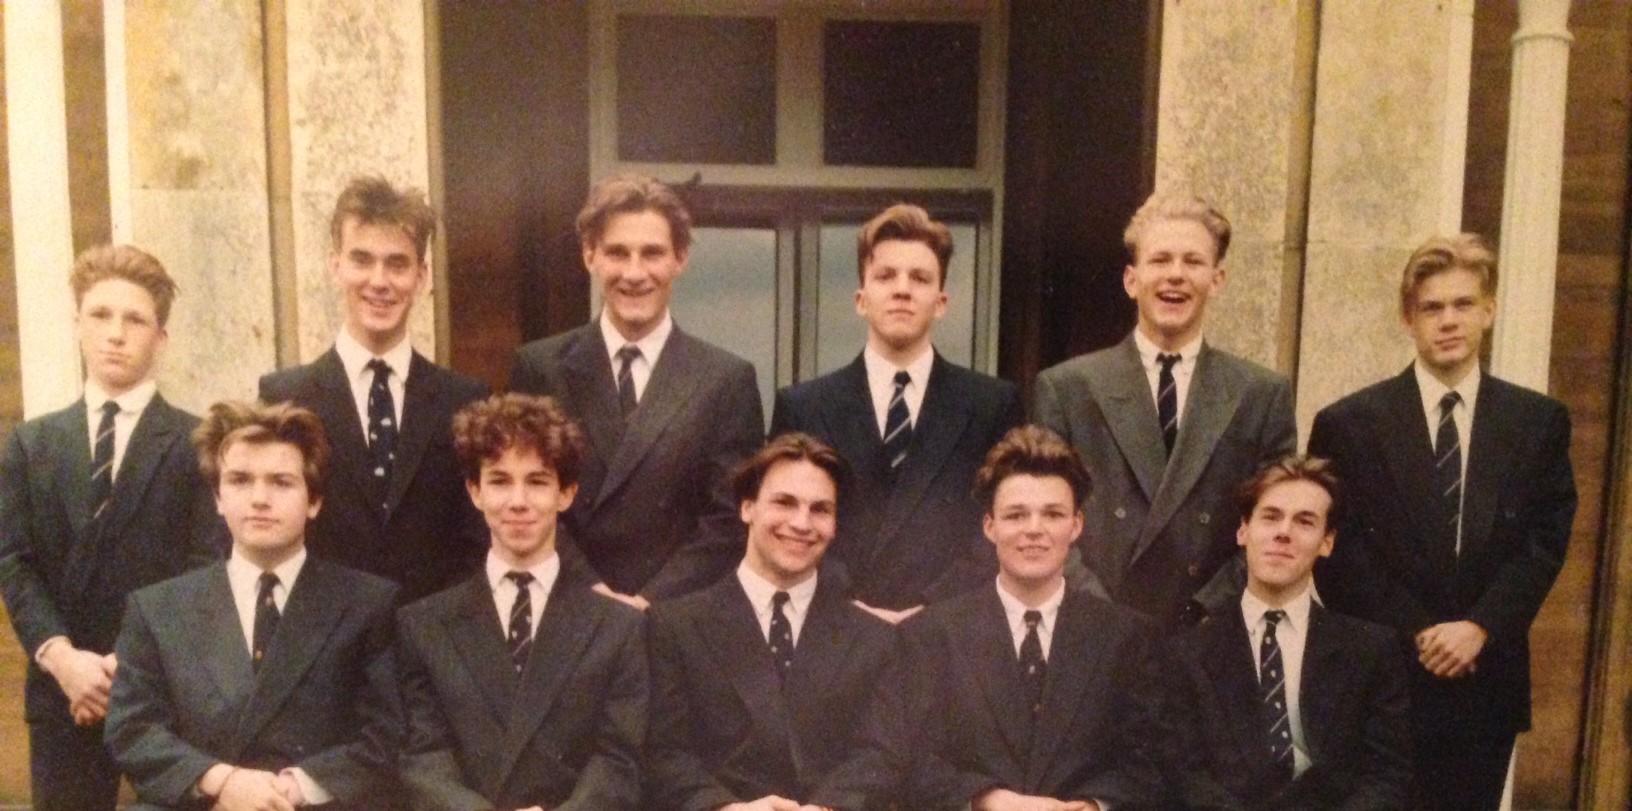 Laundimer House Upper Sixth Form 1991